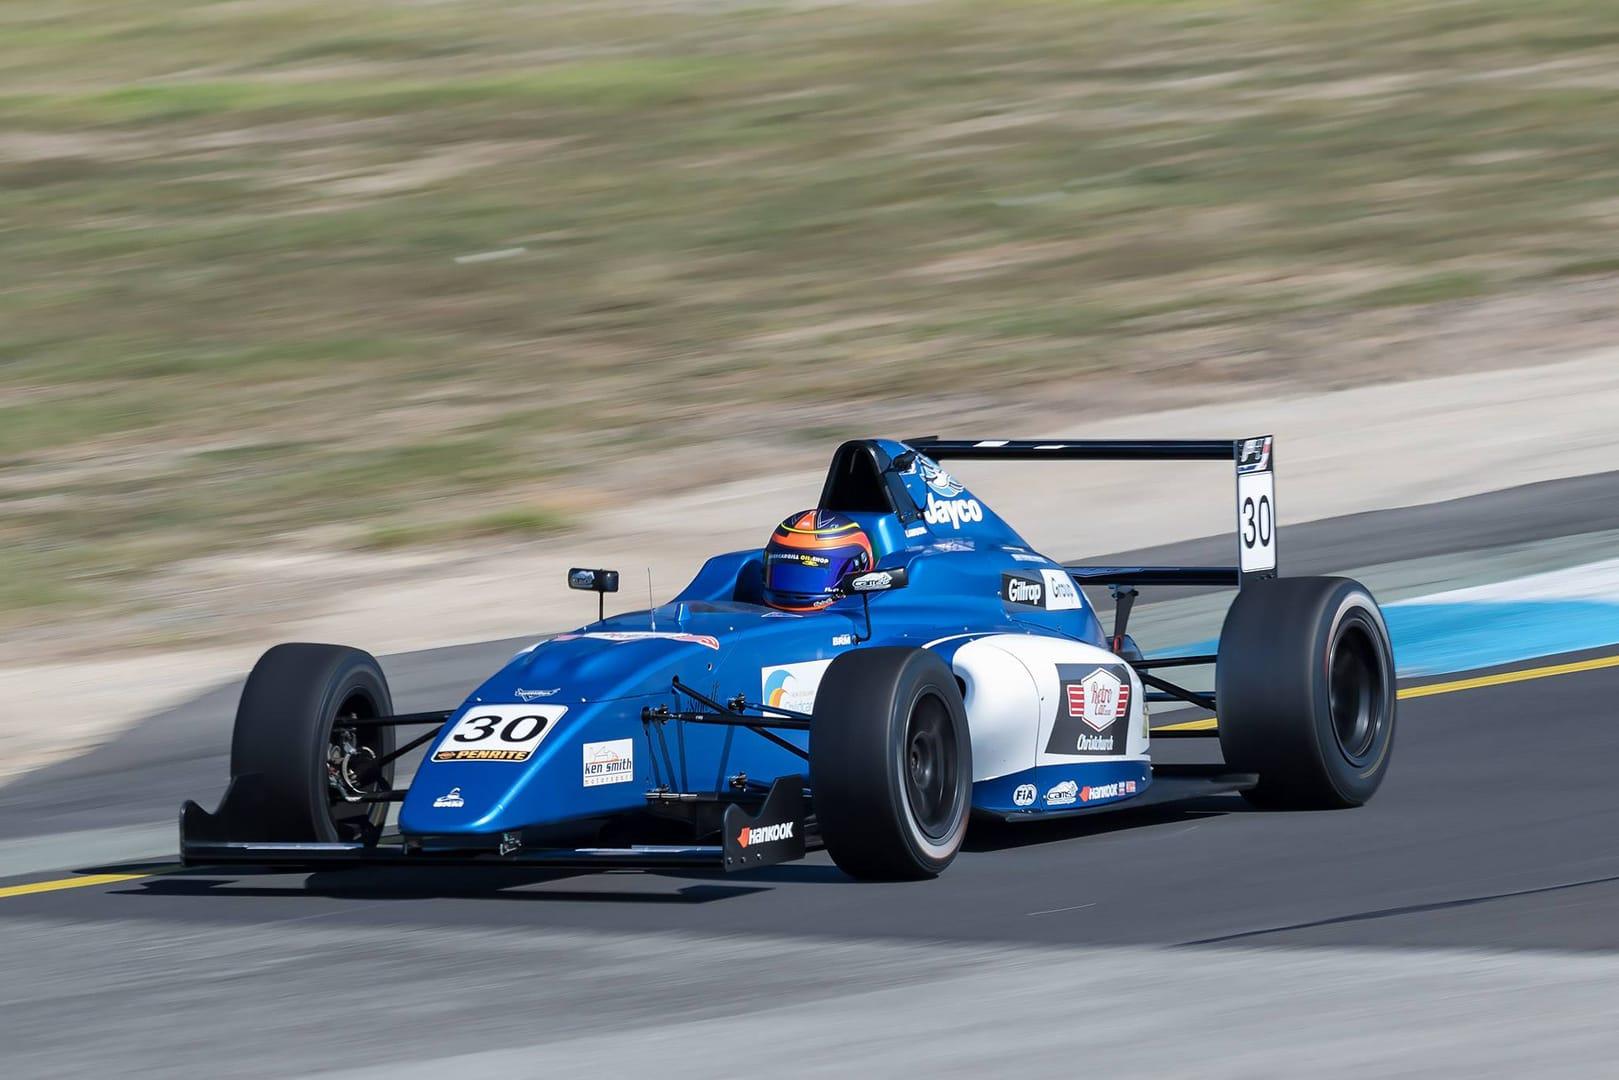 Lawson leads Australian Formula 4 championship after stunning debut